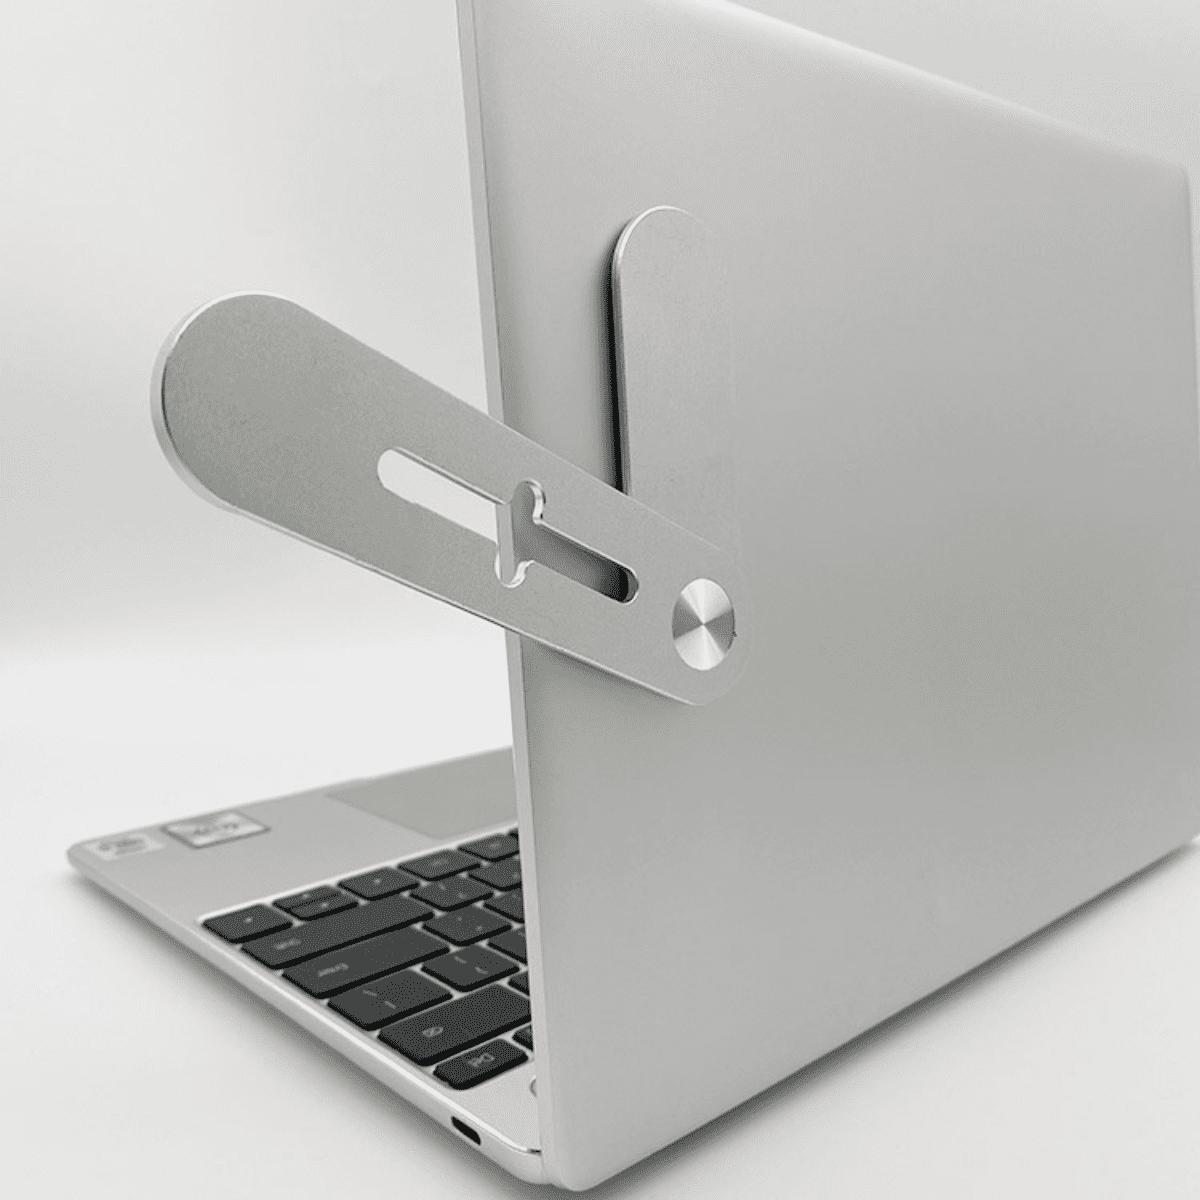 Suporte Universal Celular Clipe Mágico Notebook Magnético  - Ambientude Agro e Pet